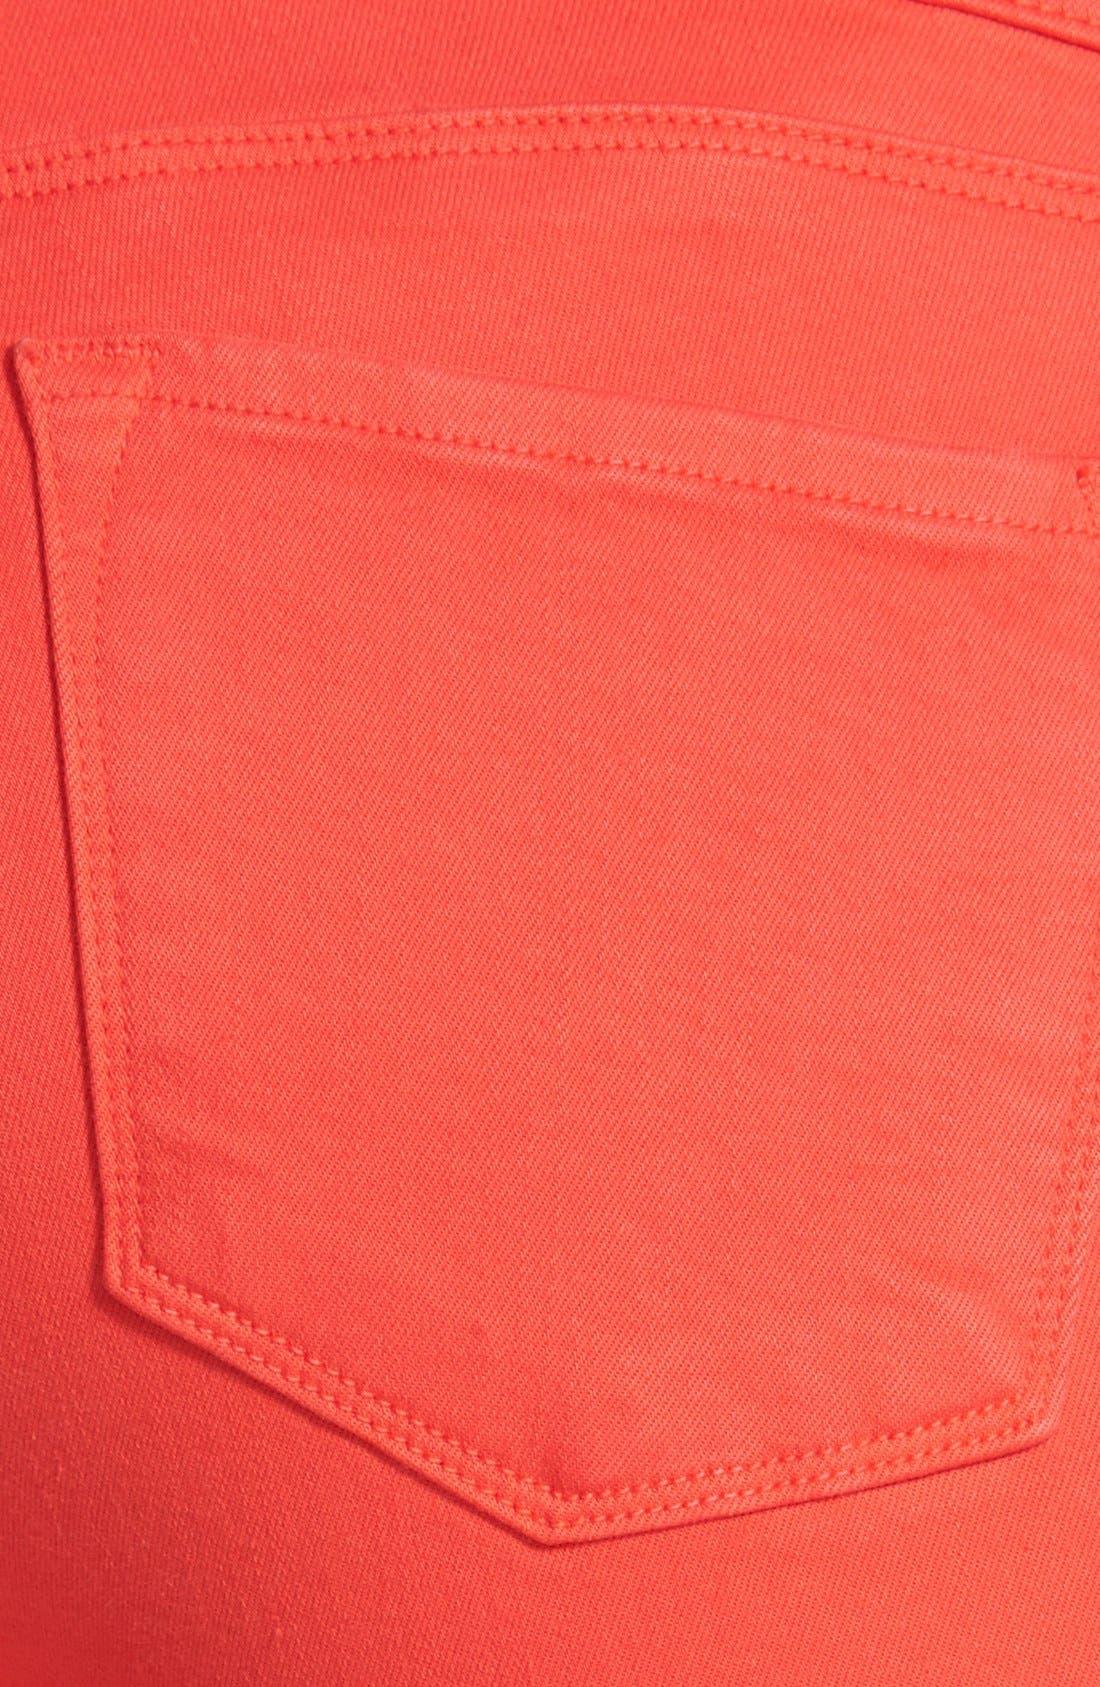 Alternate Image 3  - J Brand Low Rise Ankle Skinny Jeans